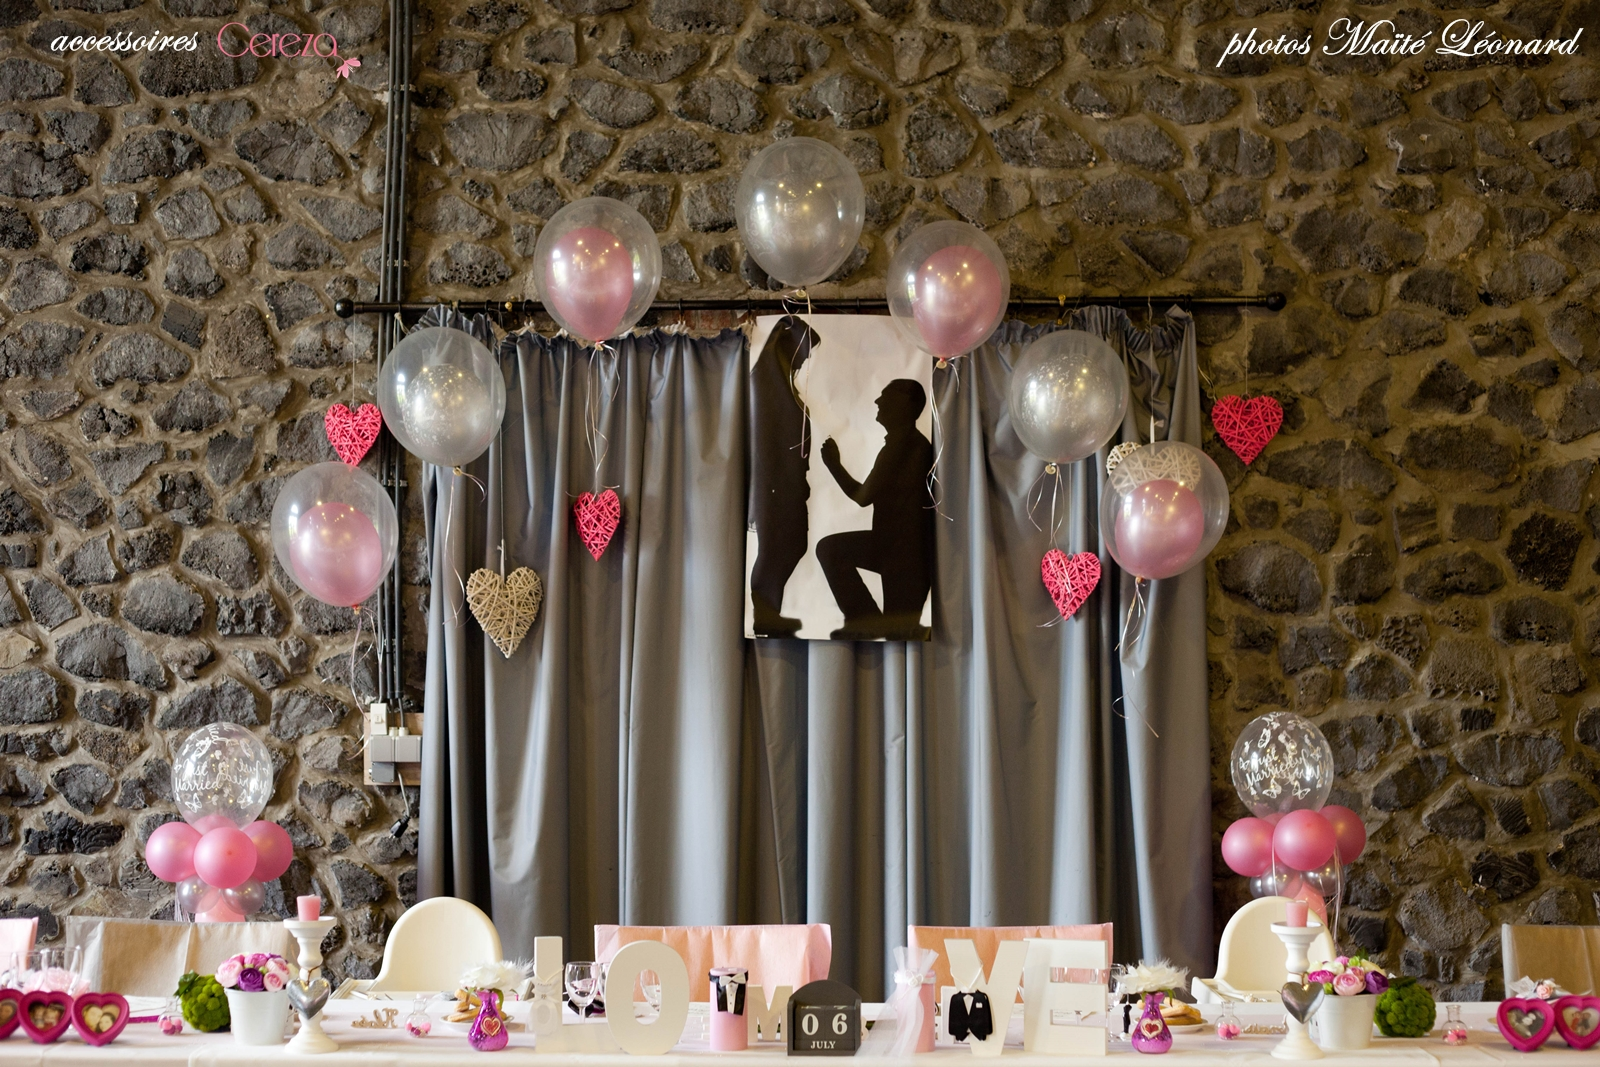 mariage romantique f rique real wedding jennifer david melle cereza blog mariage original. Black Bedroom Furniture Sets. Home Design Ideas